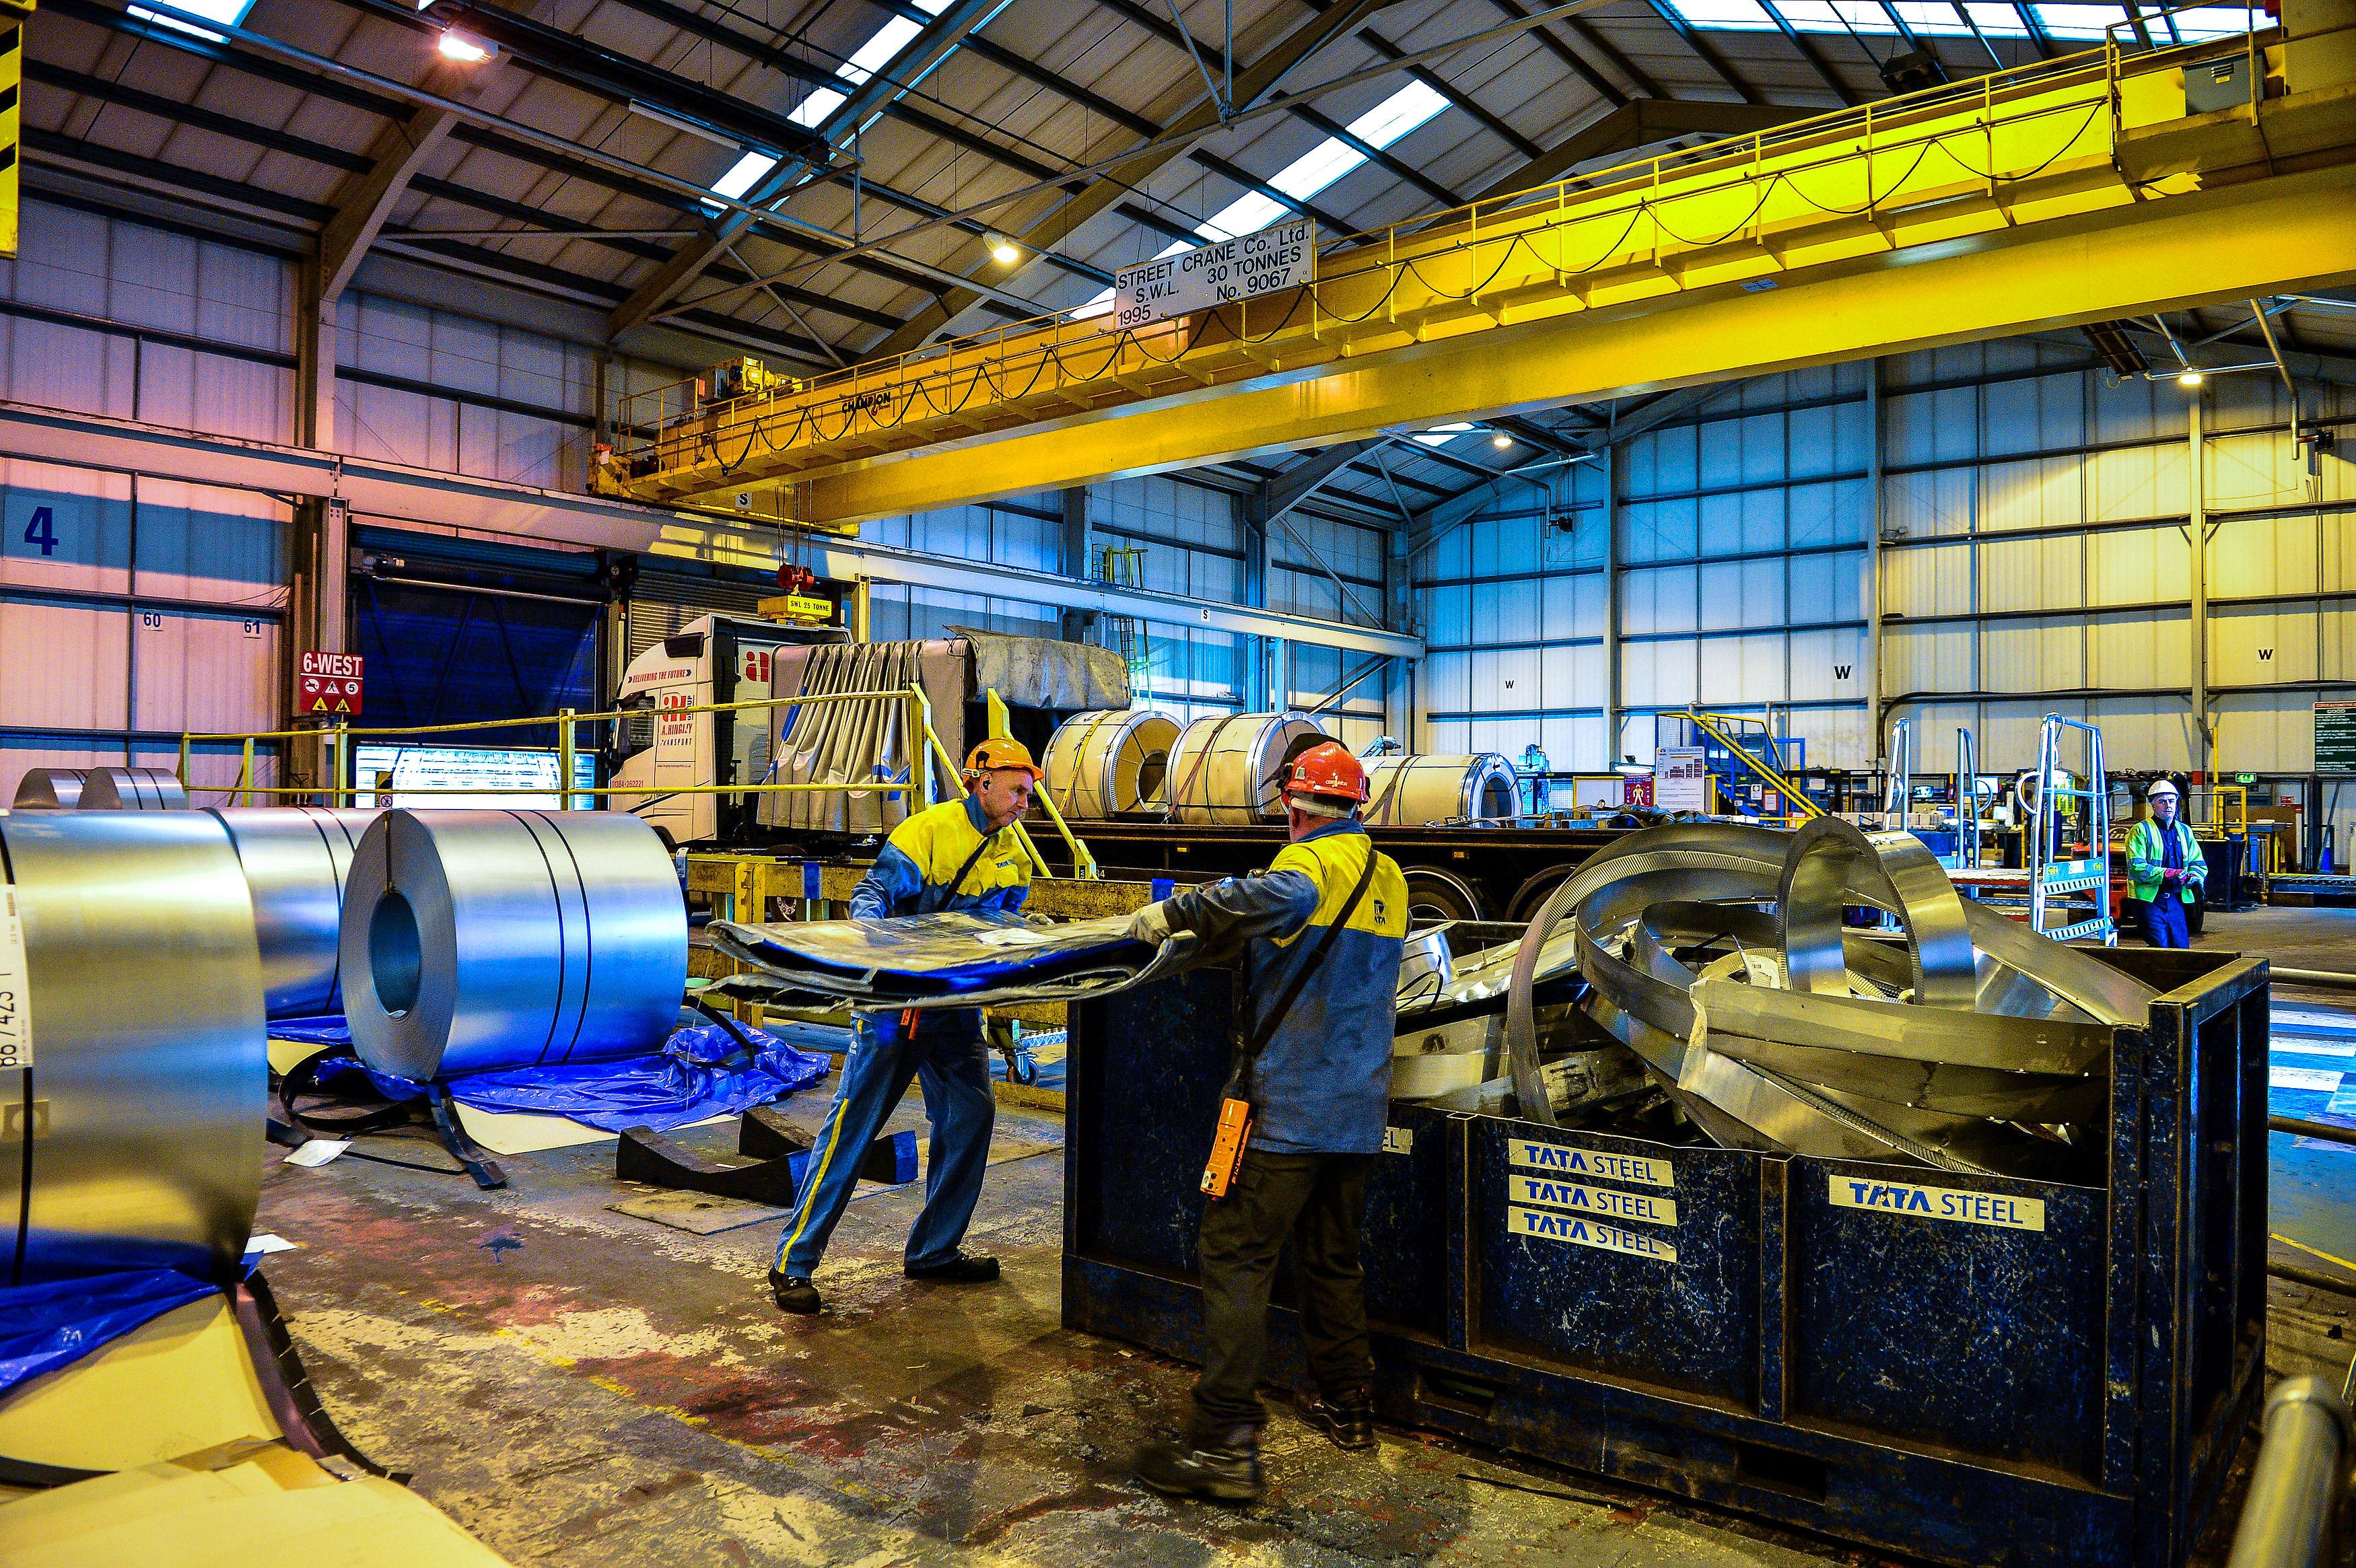 Tata Steel welding line